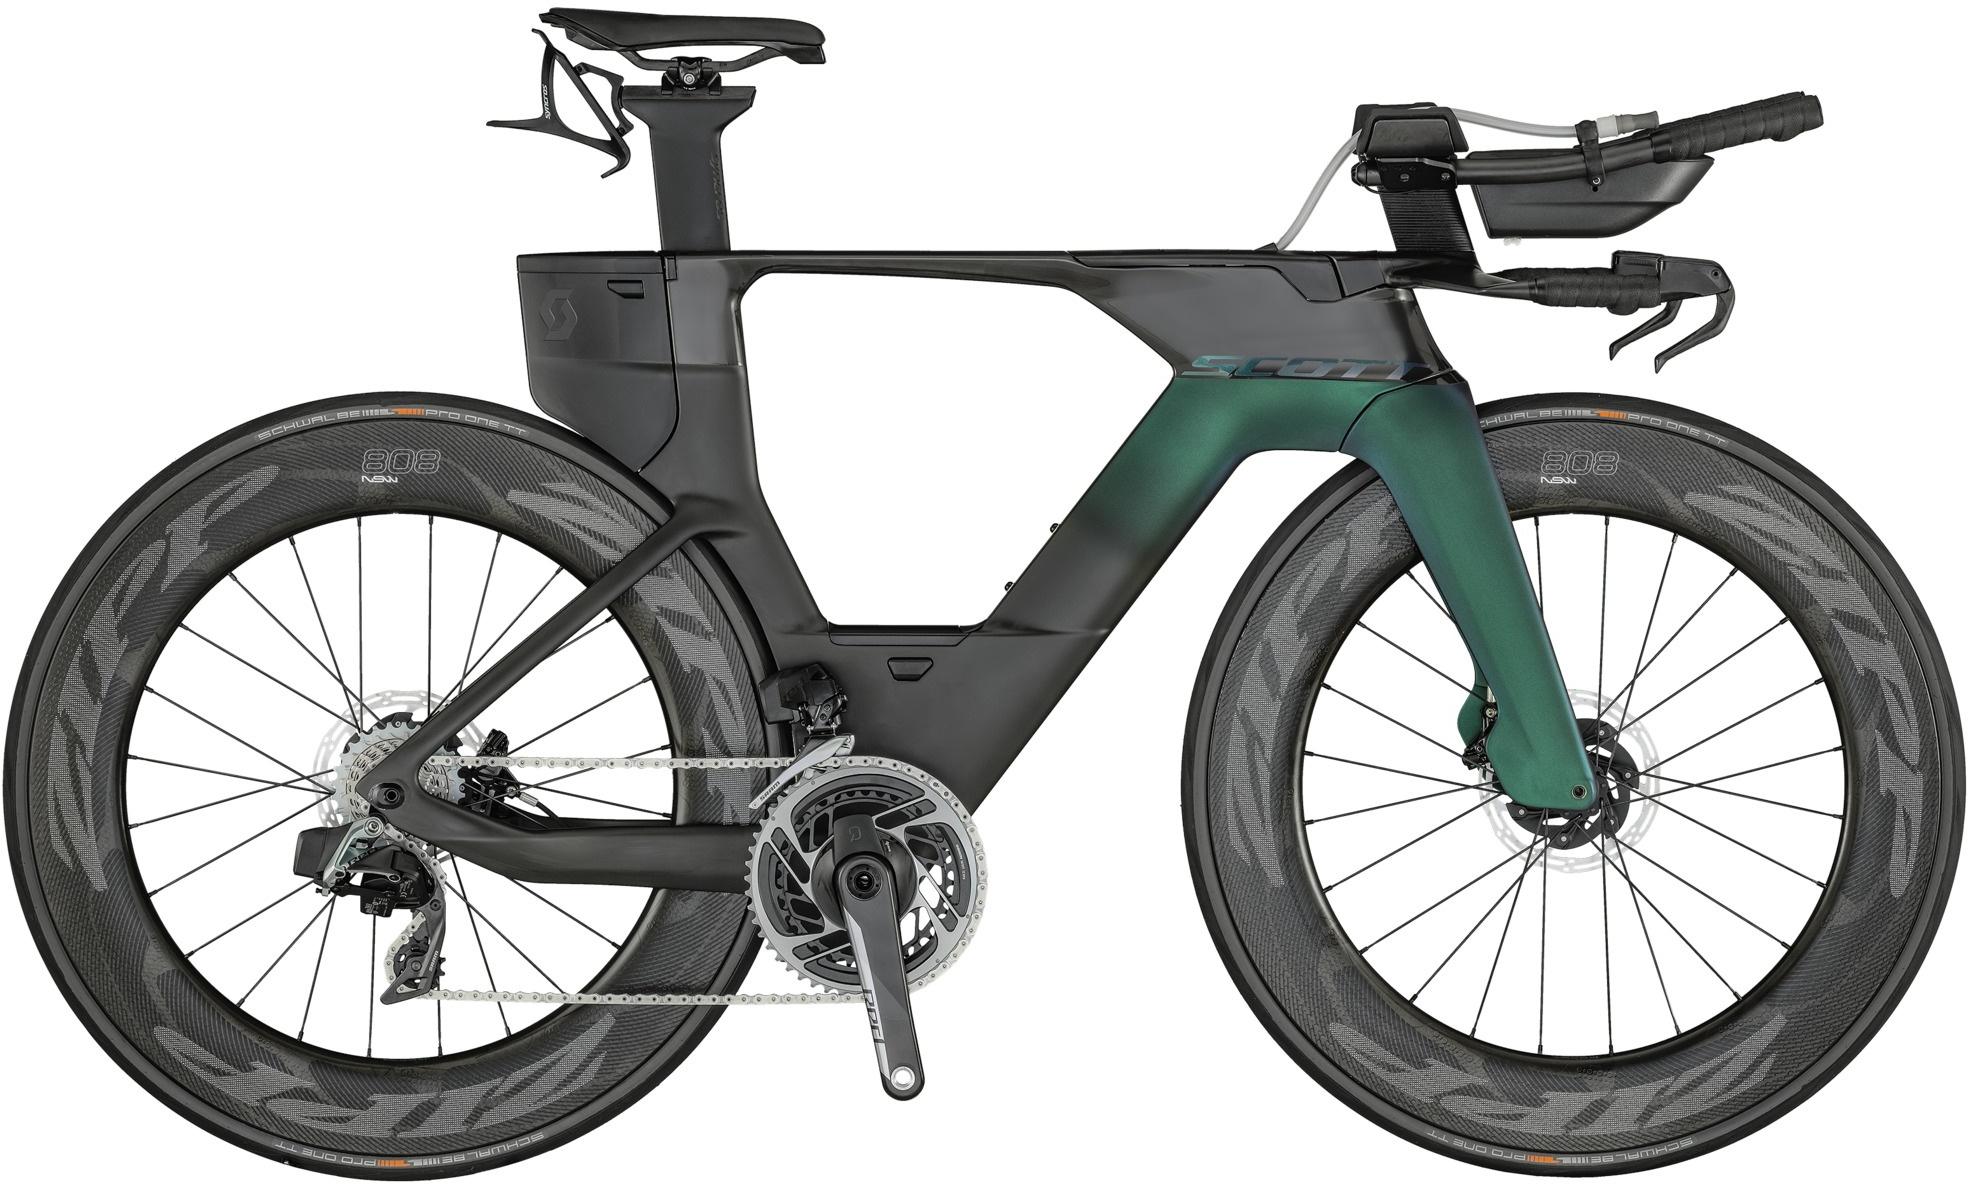 Scott Scott Plasma Premium 2021 Cykler > Racercykler